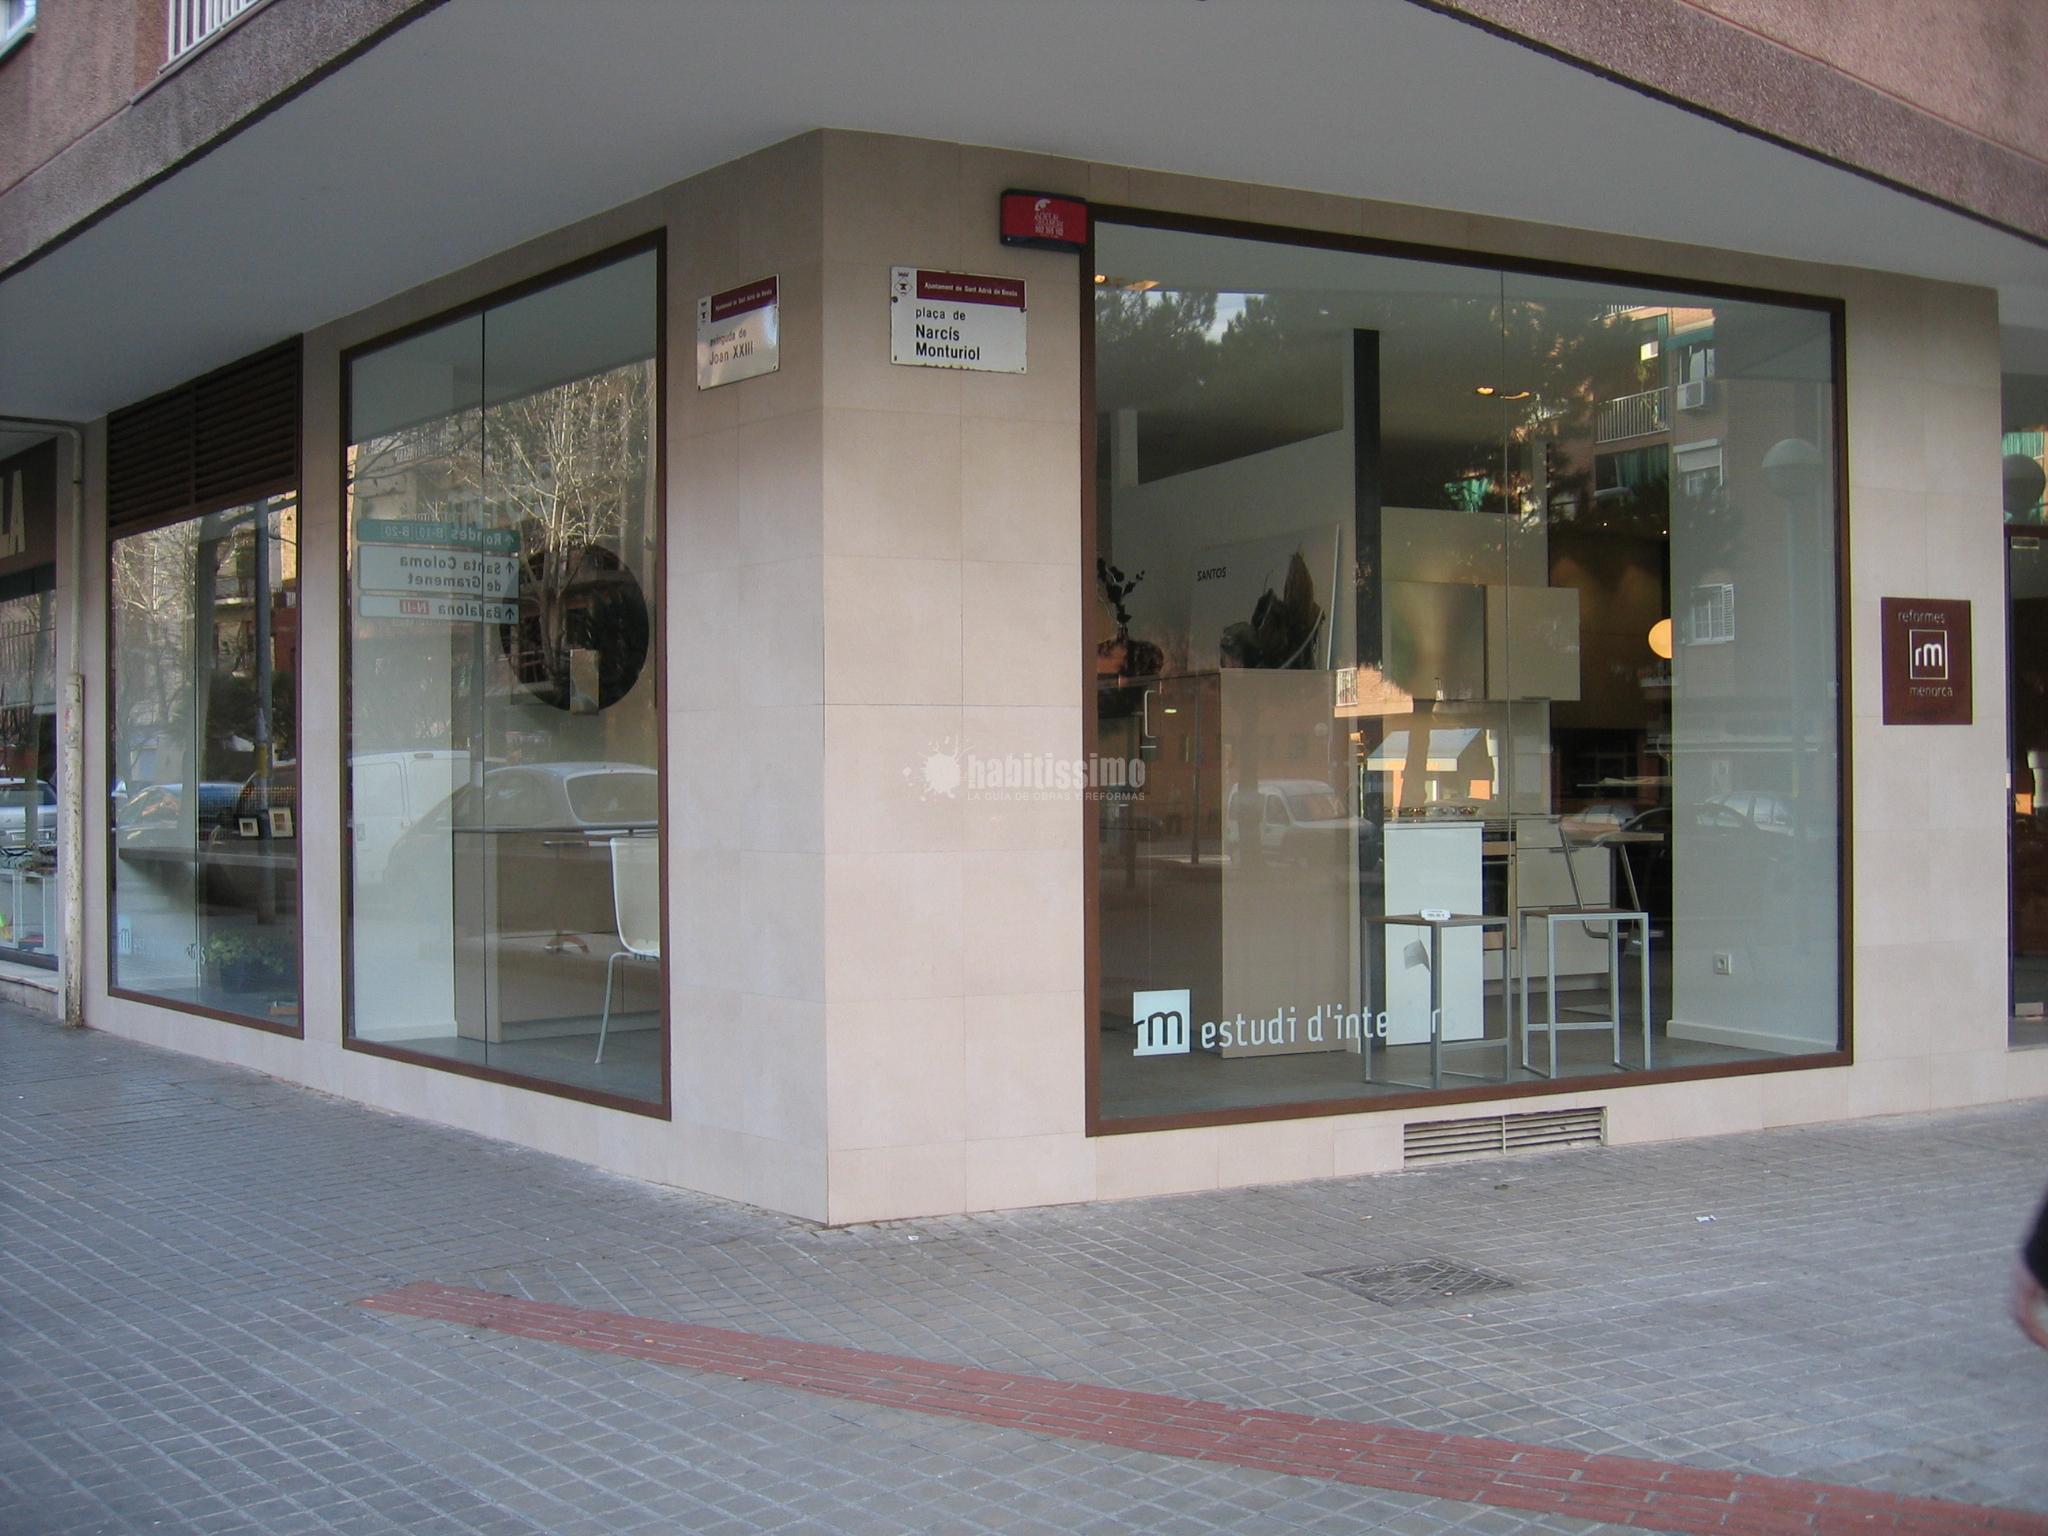 Reformas Menorca San Adrián del Besós PI Narciso Monturiol